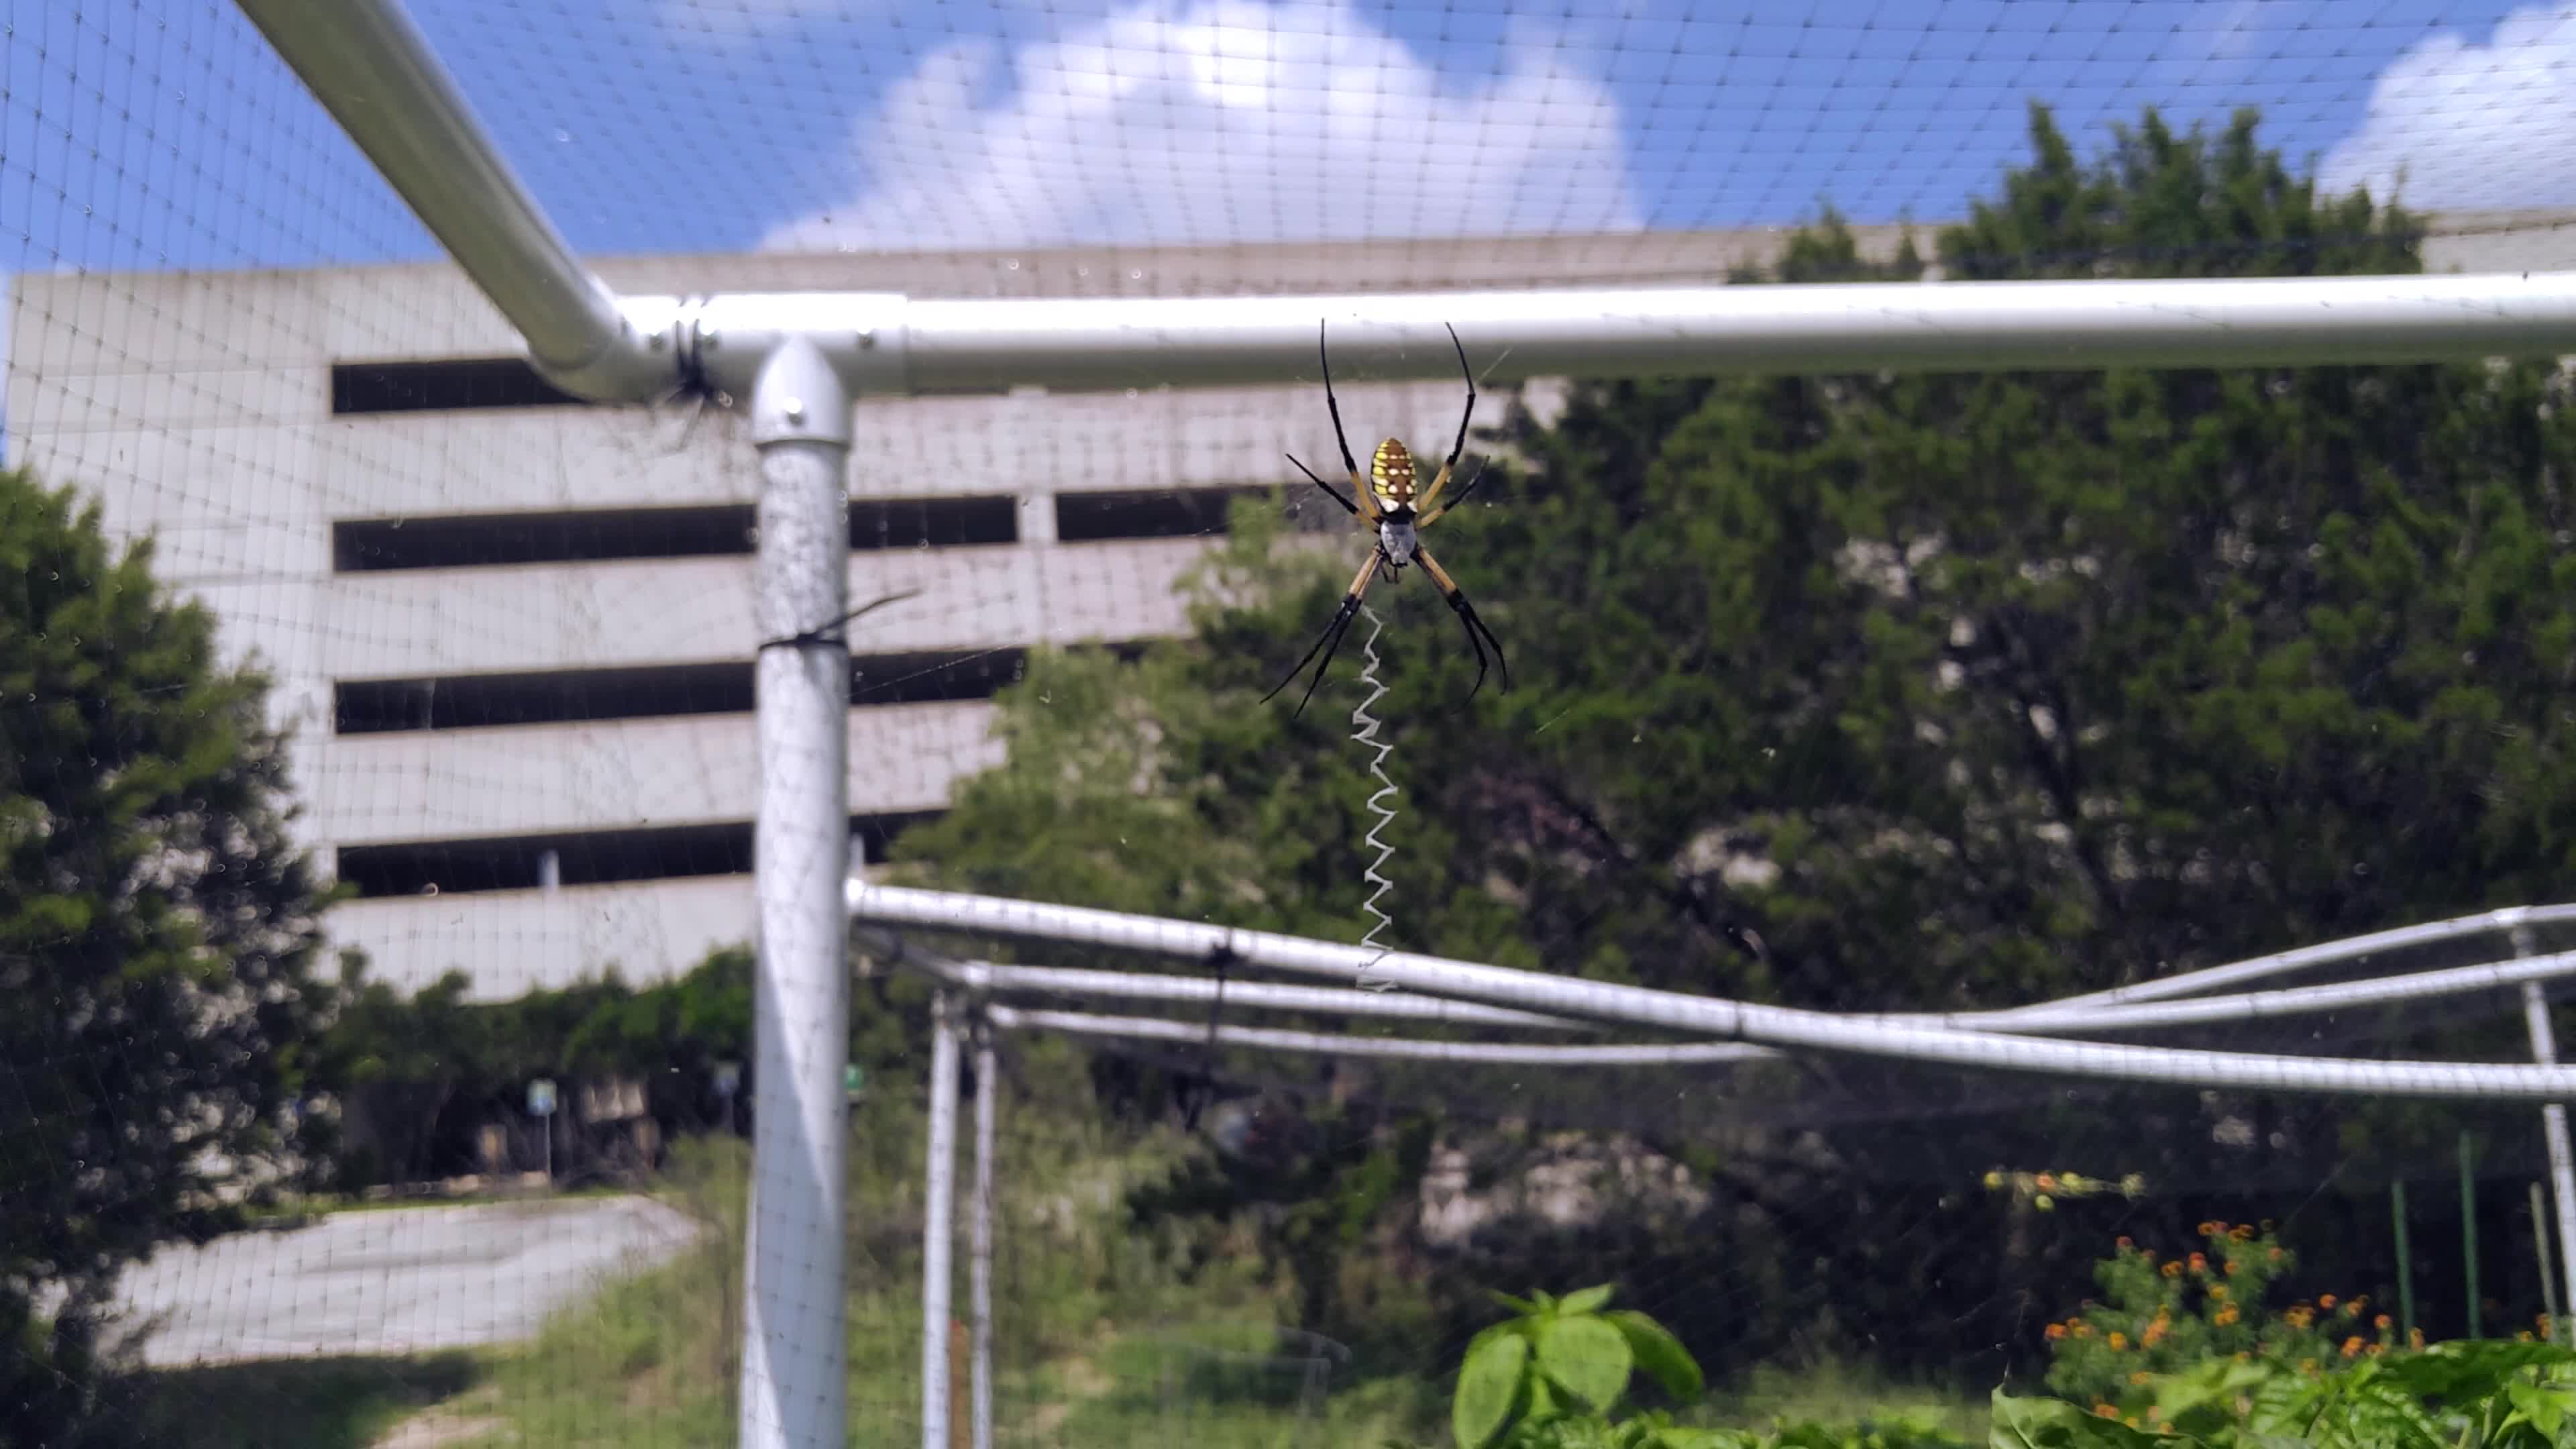 Yellow garden spiderbro (Argiope aurantia) quickly wrapping up a grasshopper GIFs